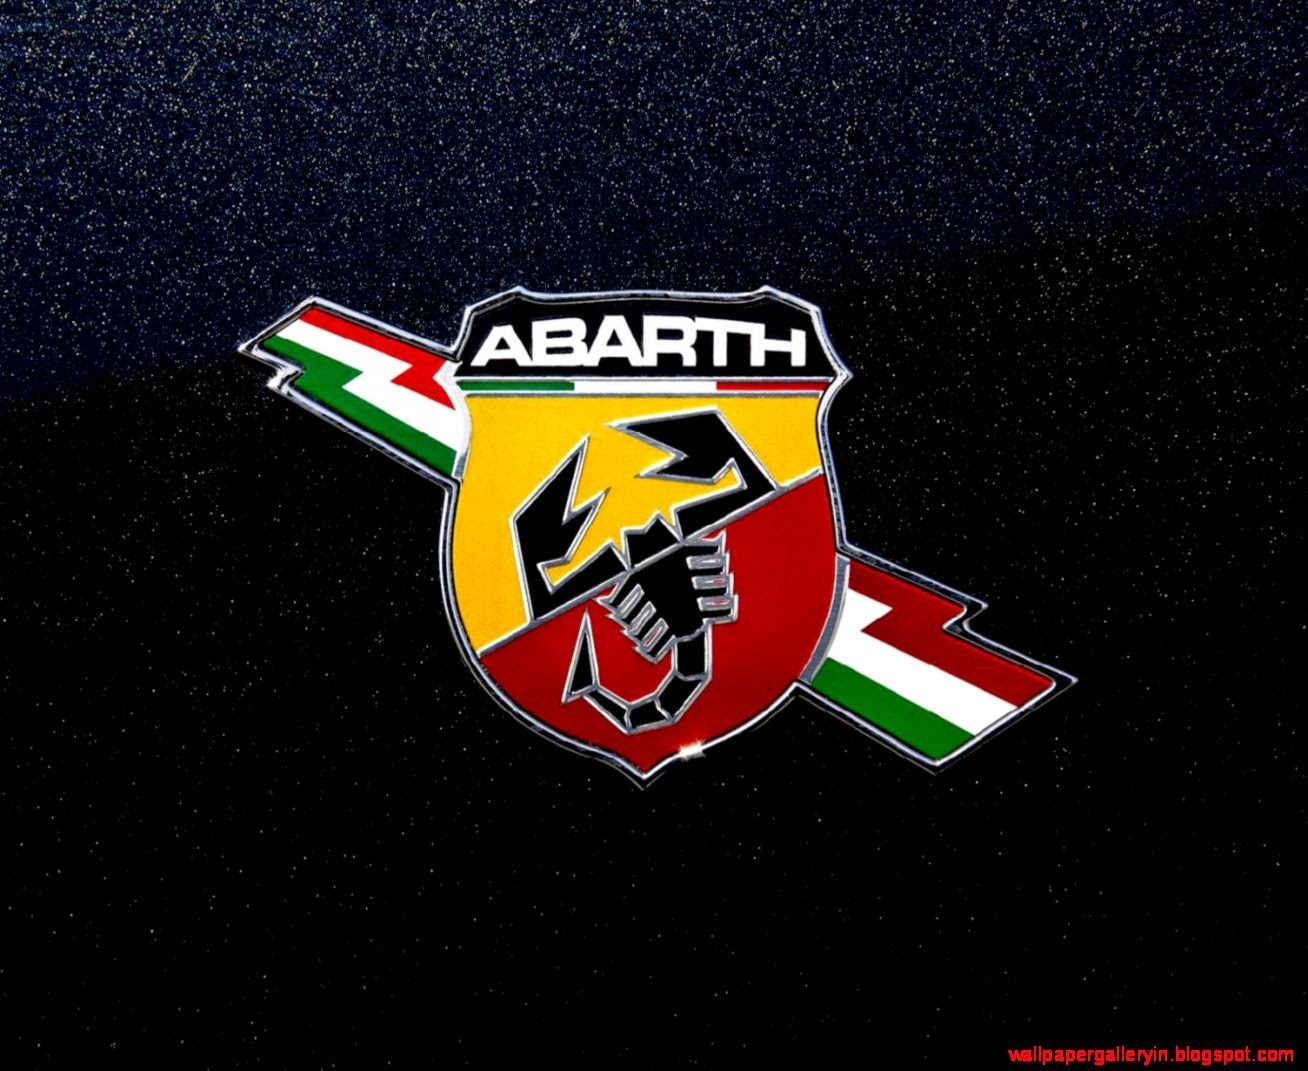 Abarth logo car wallpaper hd desktop wallpaper gallery - Car logo wallpapers ...